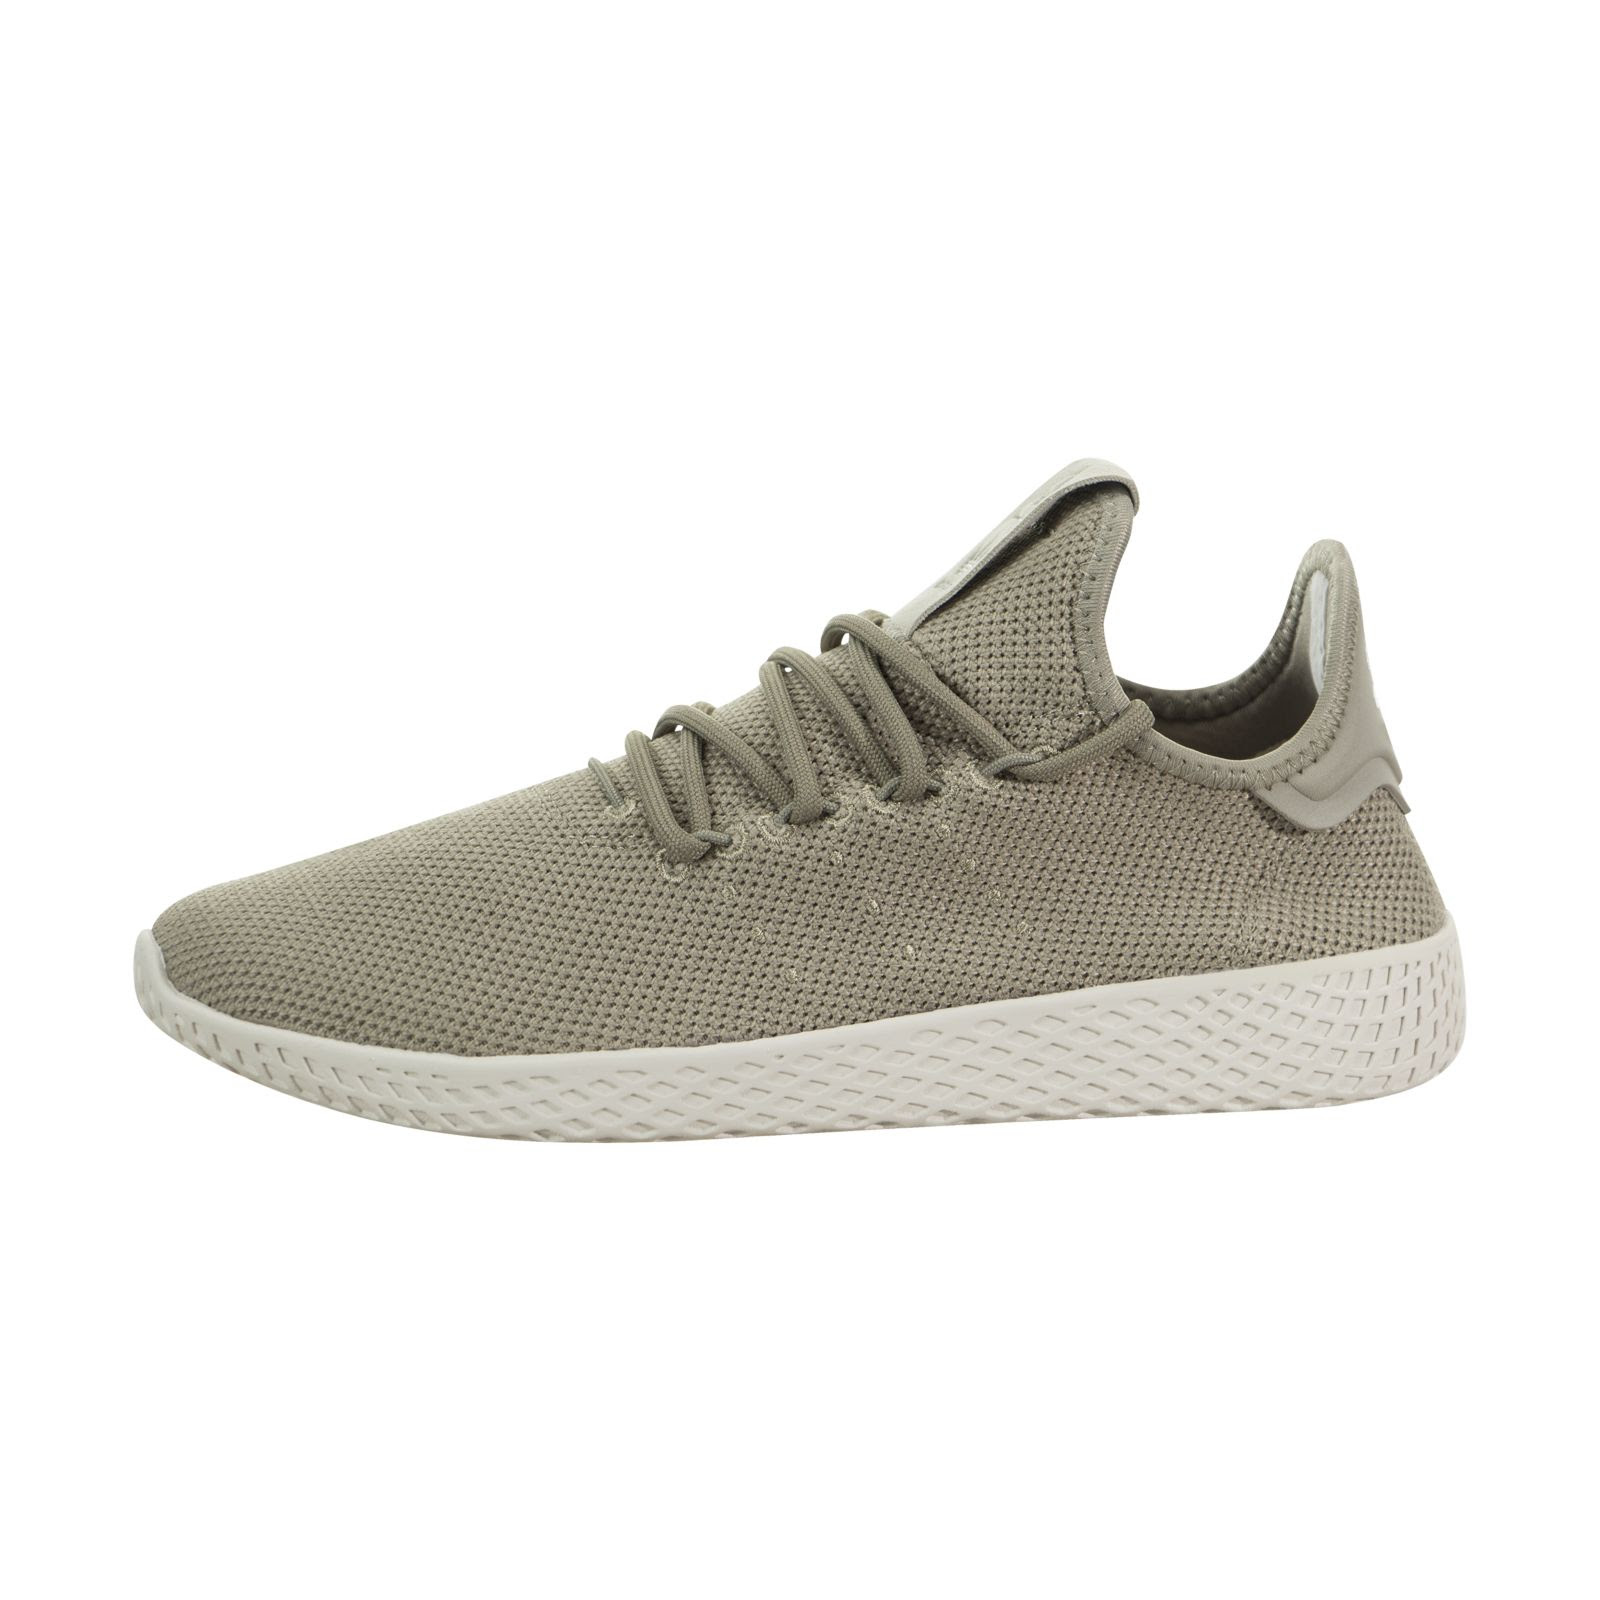 Adidas Shoes – Mens Pharrell Williams Tennis Hu CarbonCarbonBlacra Adidas, Adidas Pharrell Williams